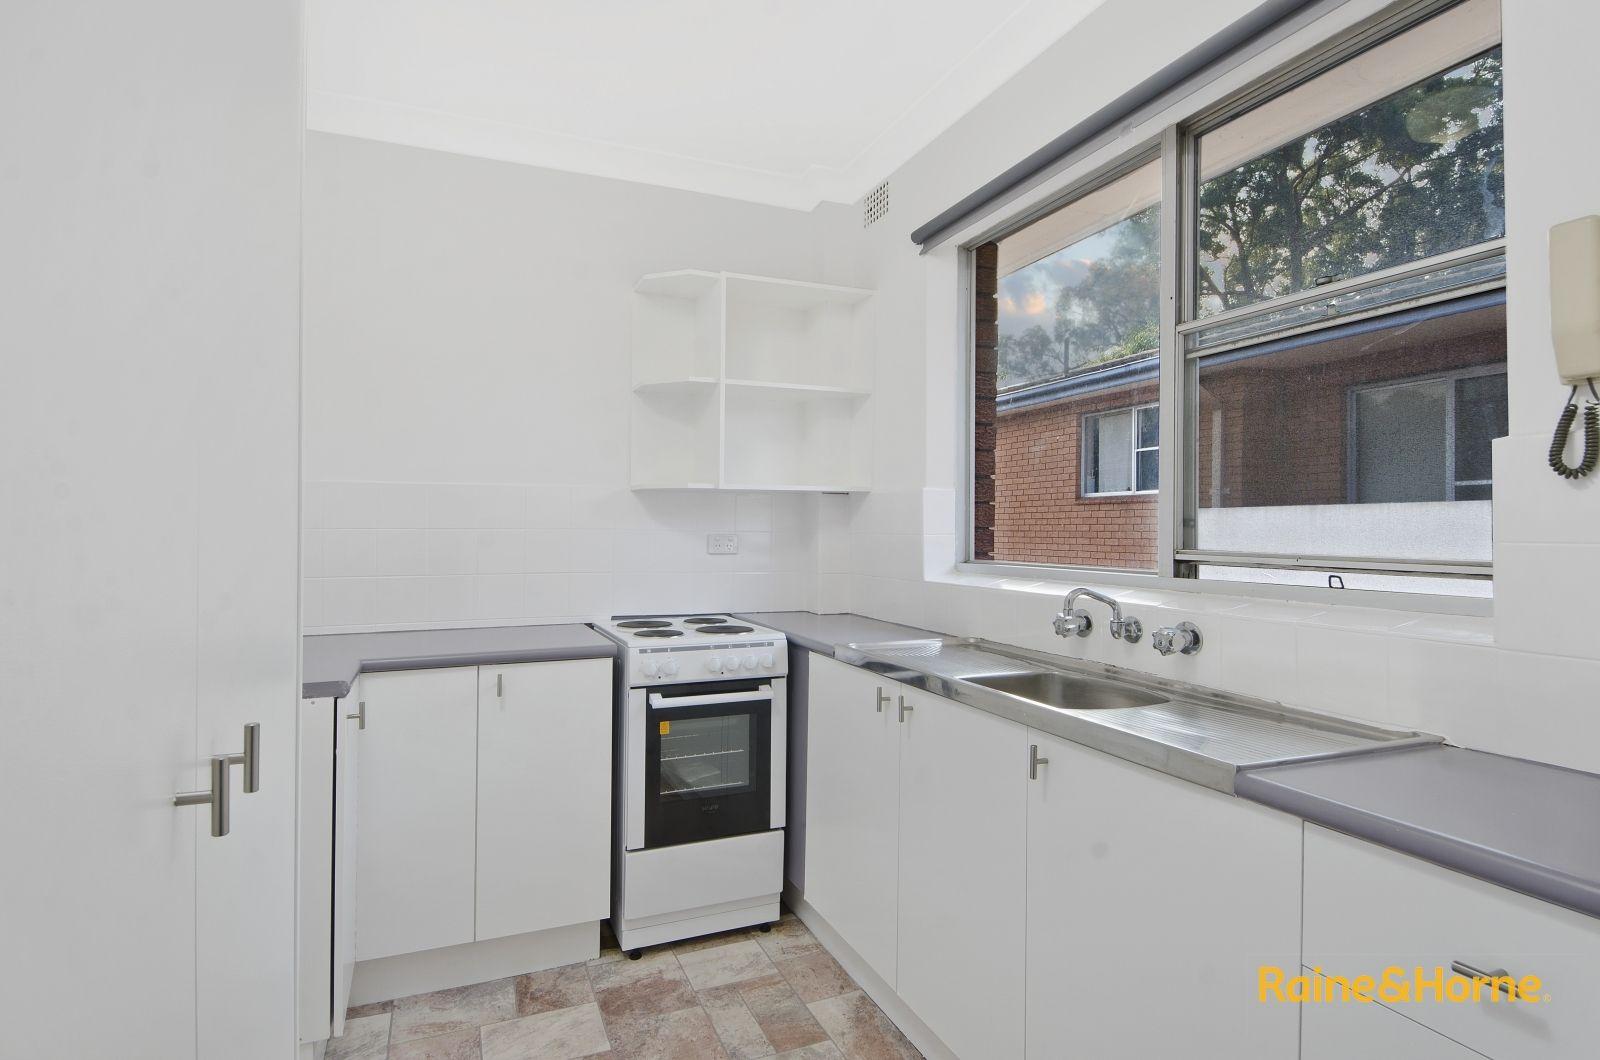 10/44 Forster Street, West Ryde NSW 2114, Image 2